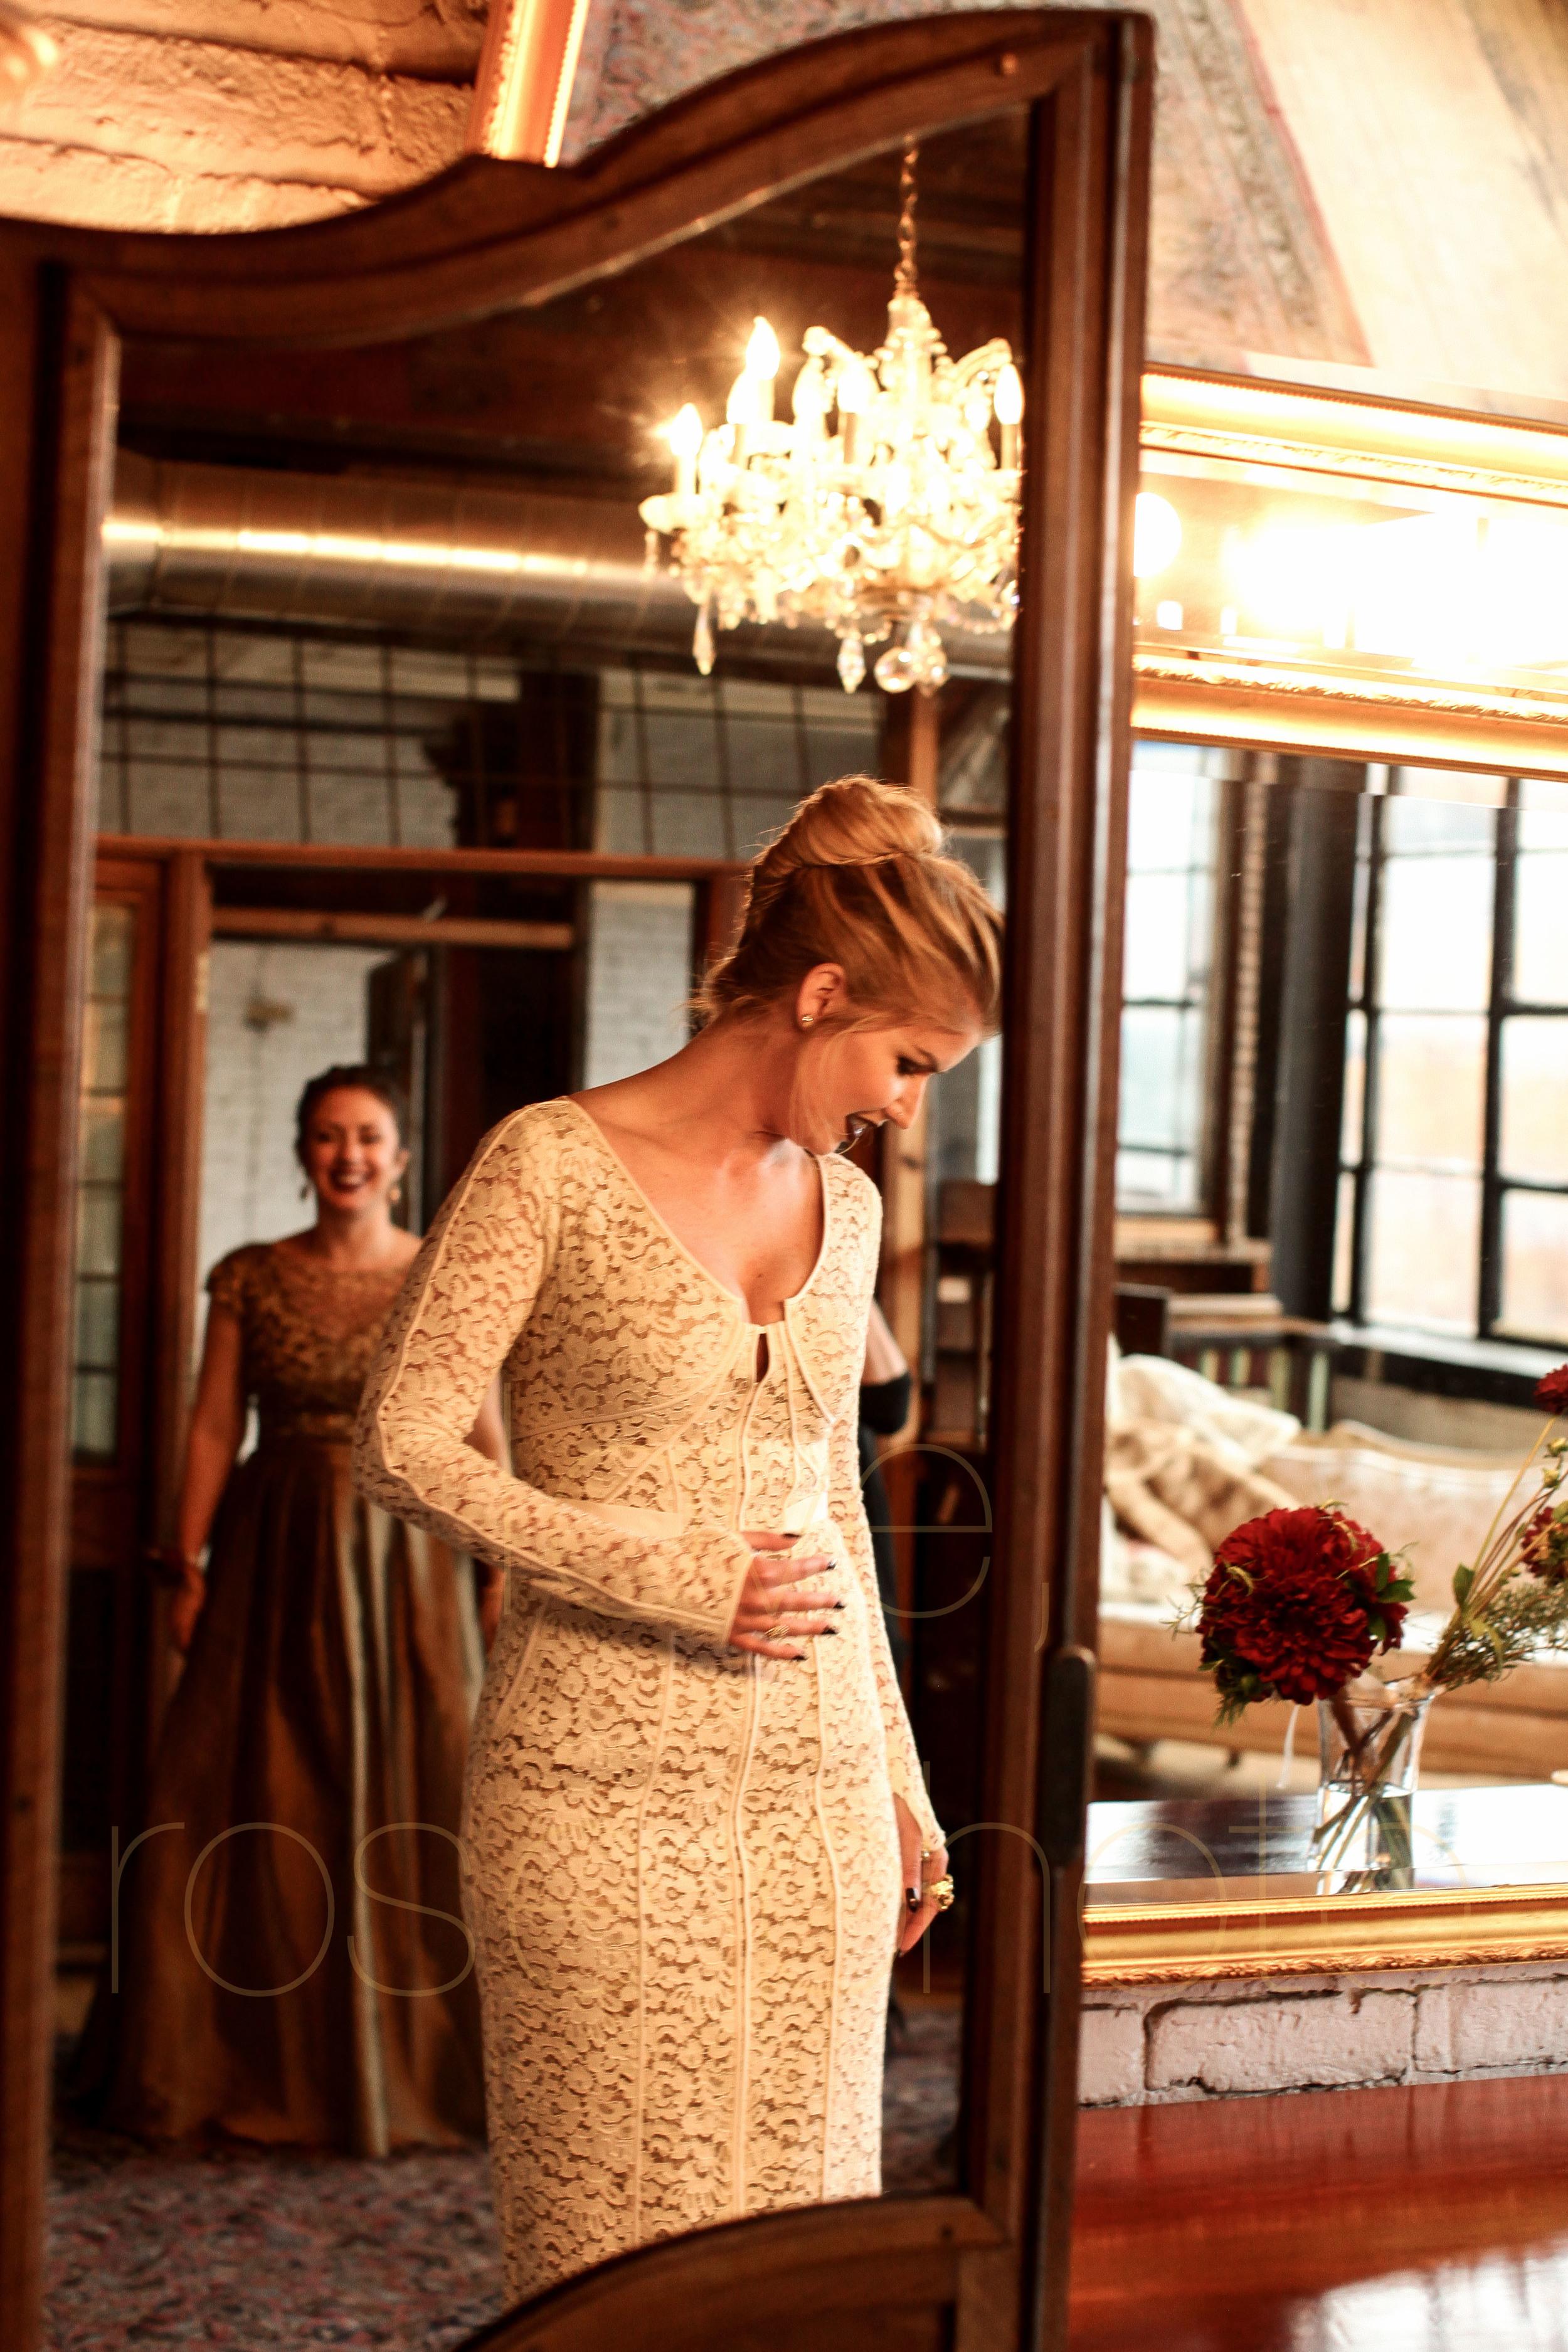 West Fulton Chicago Wedding Venue Salvage One photography enagement photos bride groom first dance-9.jpg